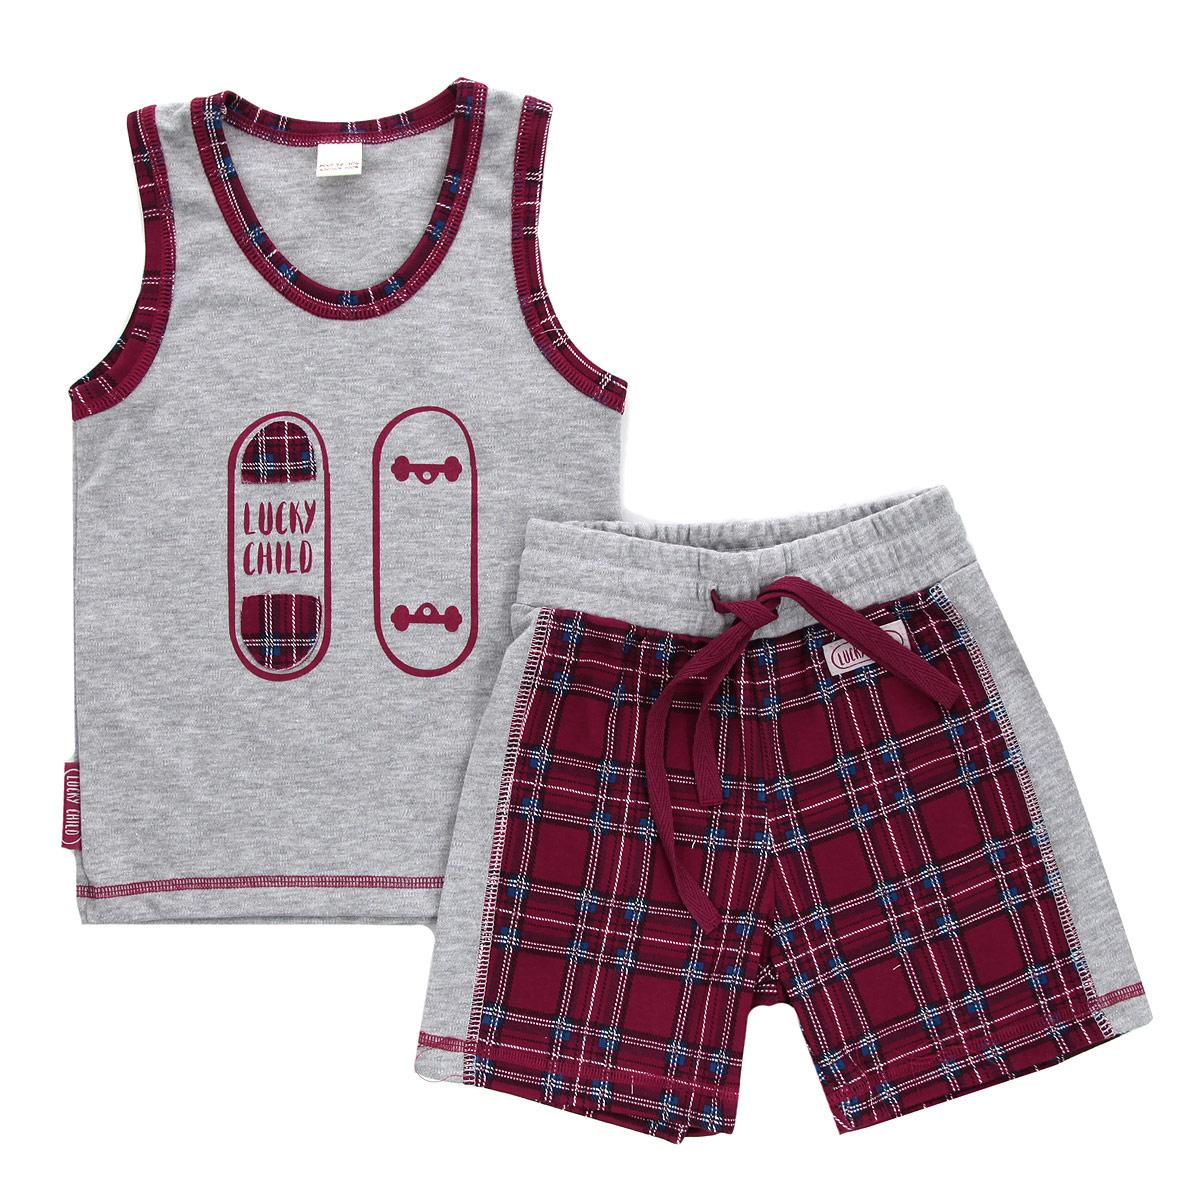 Комплект для мальчика Lucky Child: майка, шорты, цвет: красный, серый. 13-410. Размер 86/92